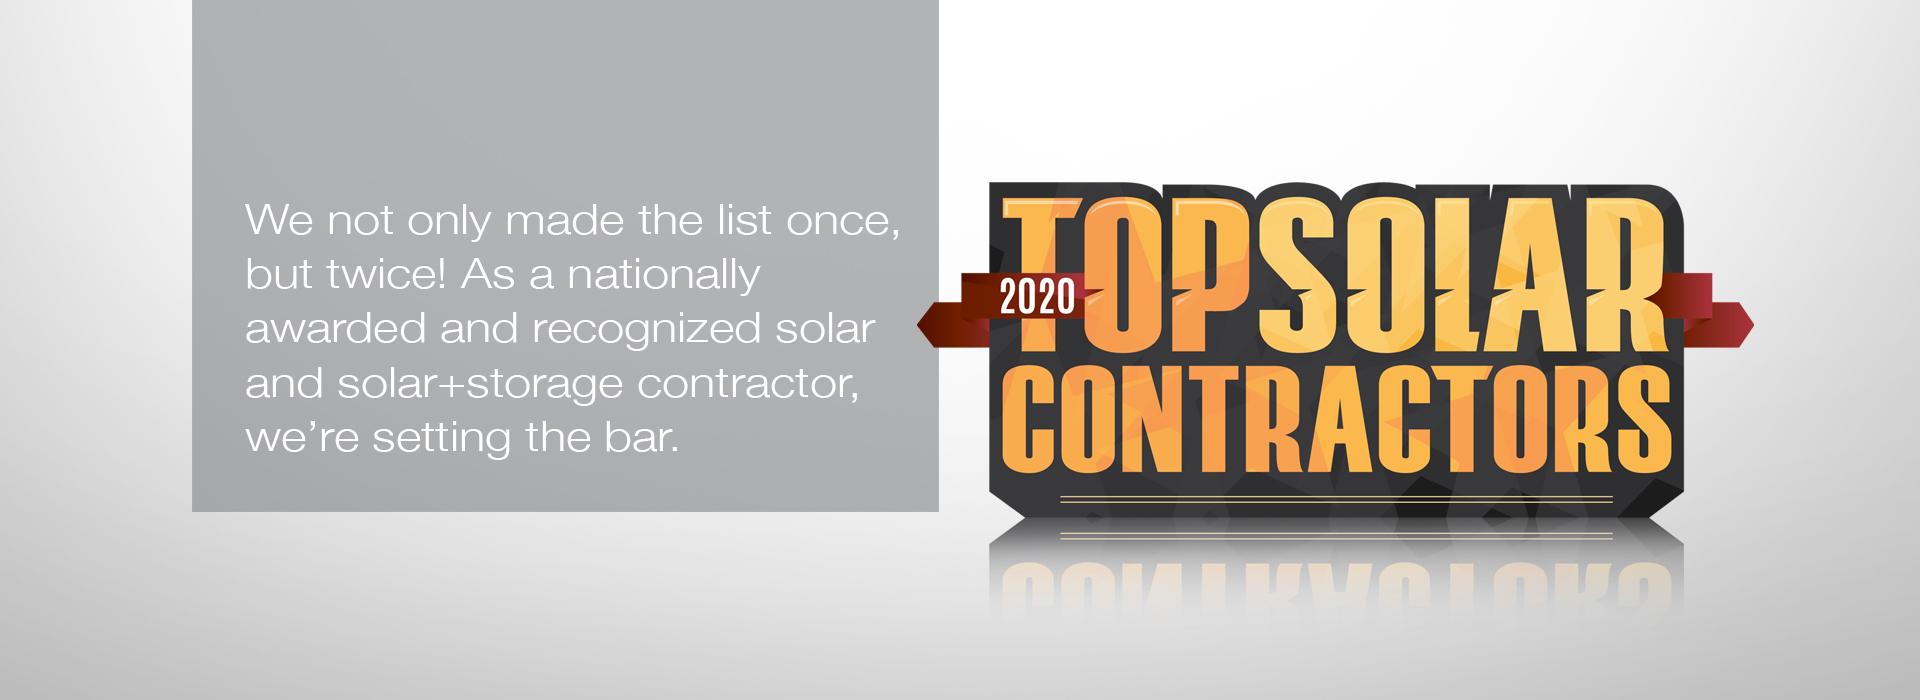 EPS_1920X700_ROTATOR_TOP_SOLAR_CONTRACTOR_V3